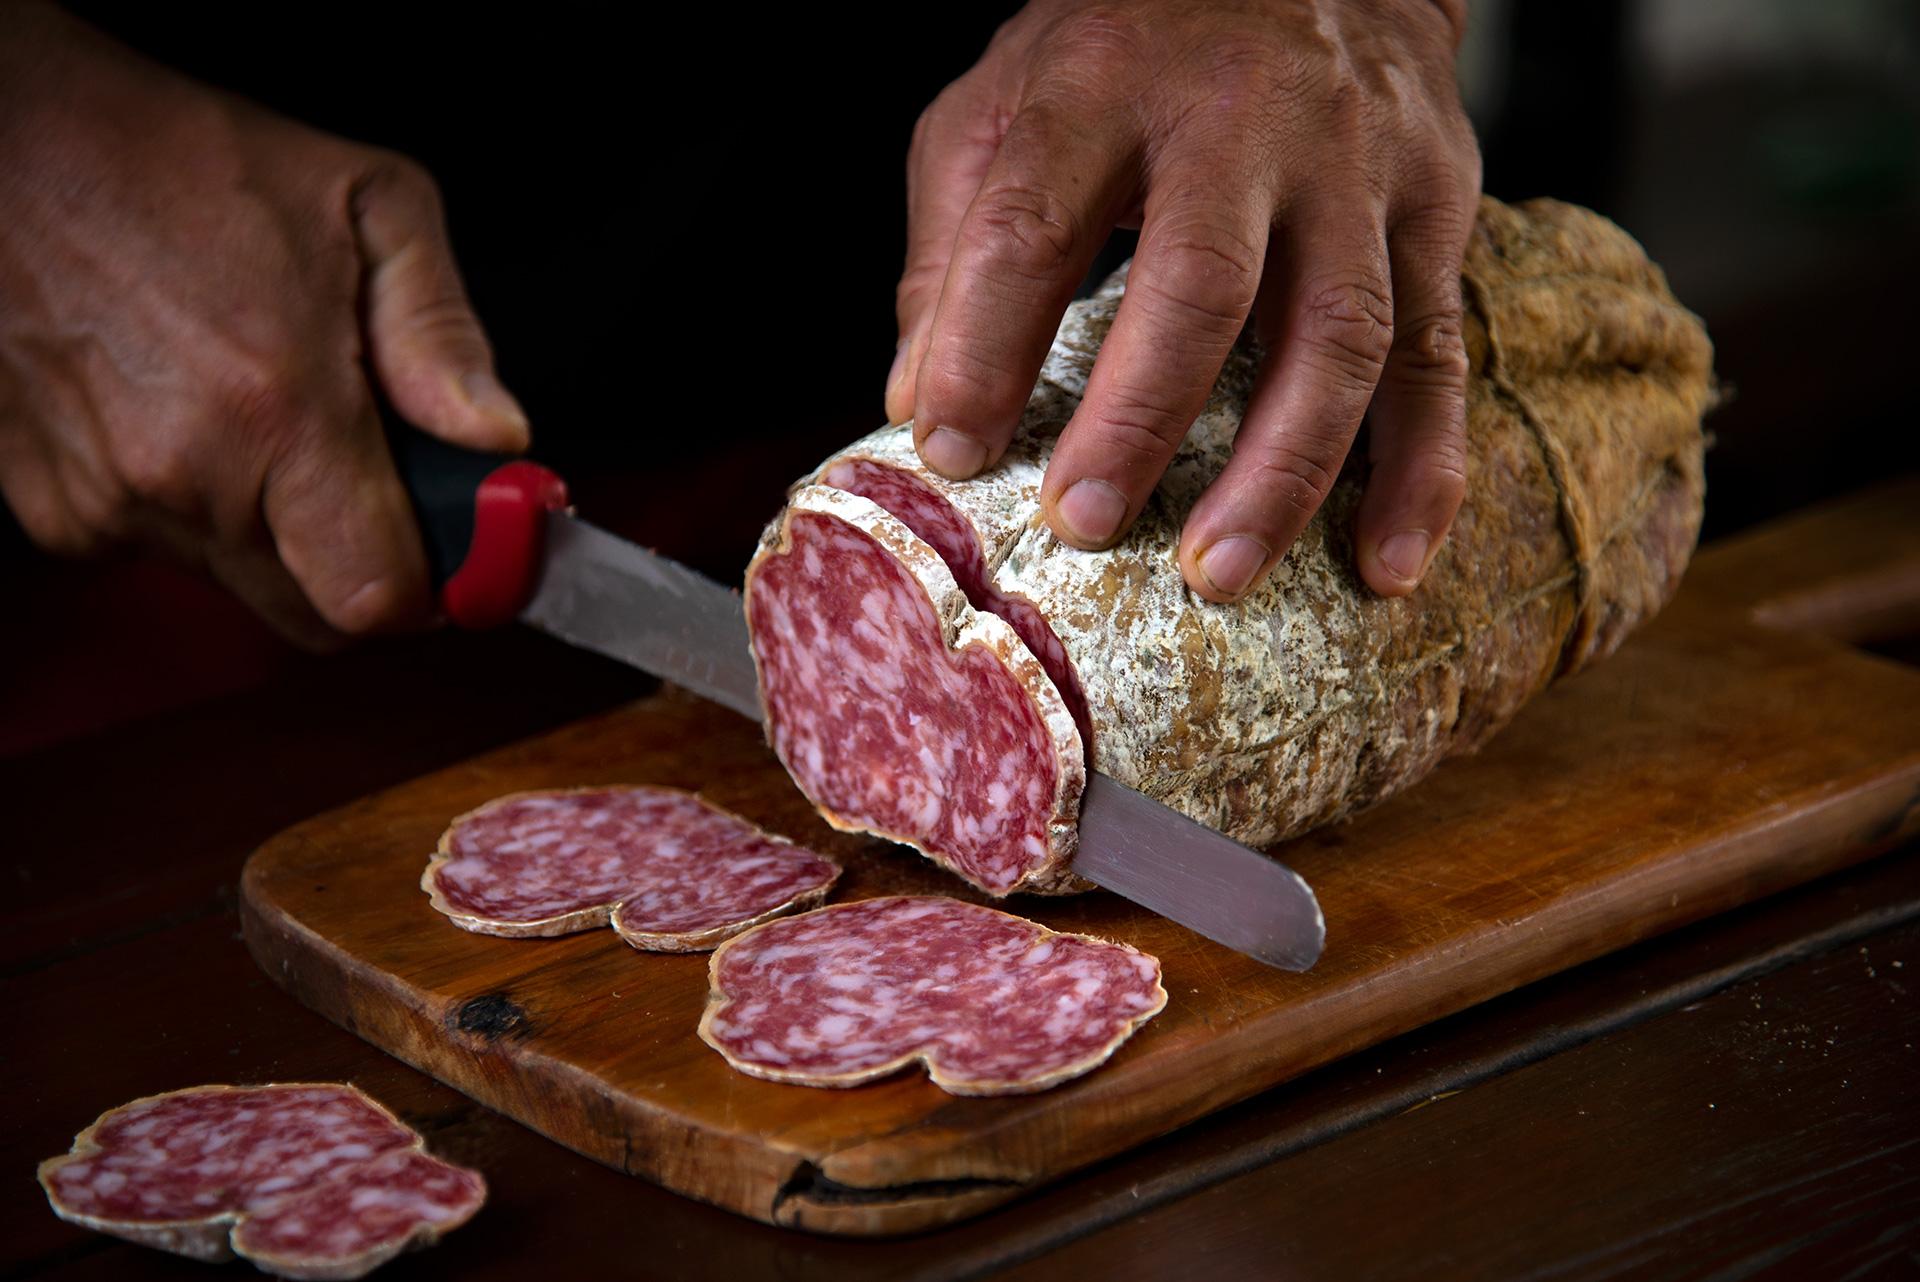 A Cremona è Festa del salame, 26-28 ottobre - www.efanews.eu